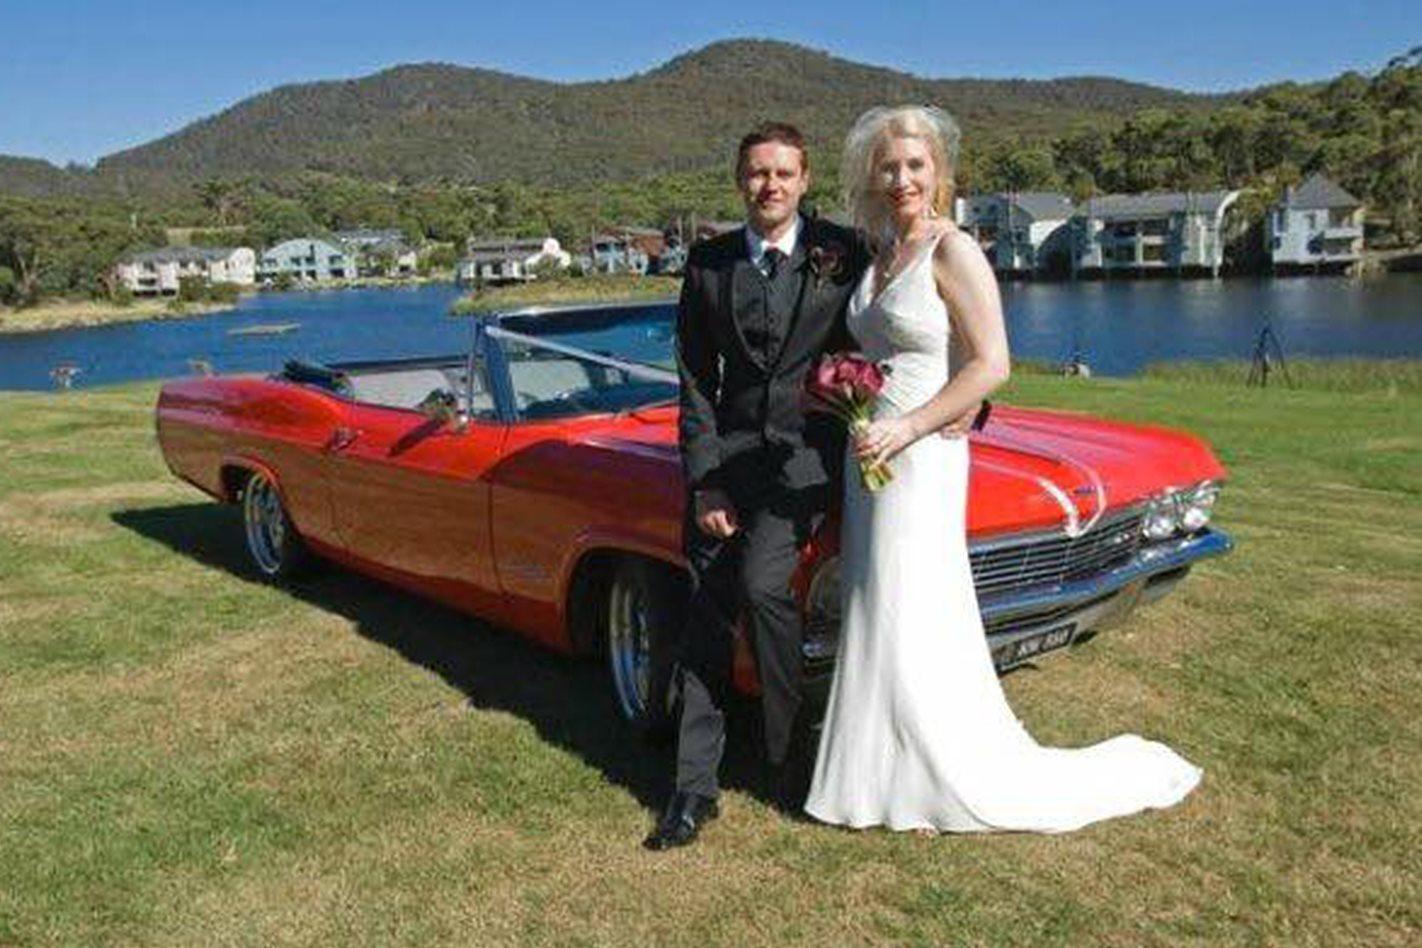 Scott Wright's Impala wedding car